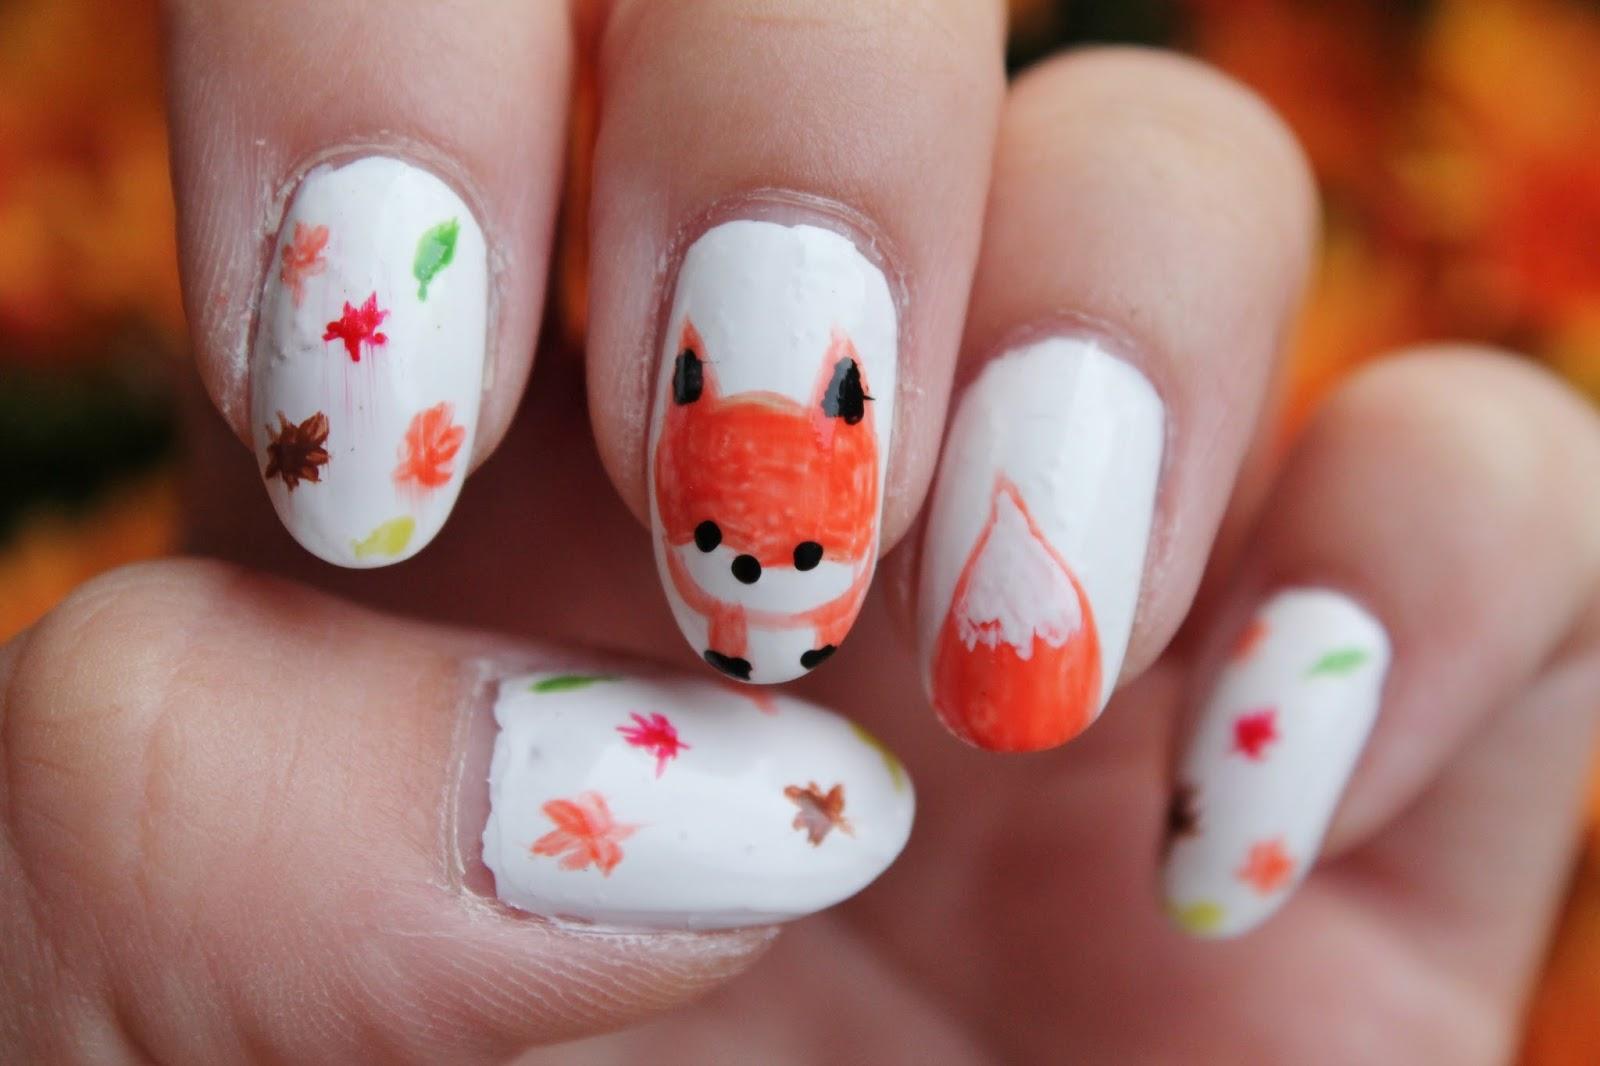 Fox Nail Art - Jersey Girl, Texan Heart